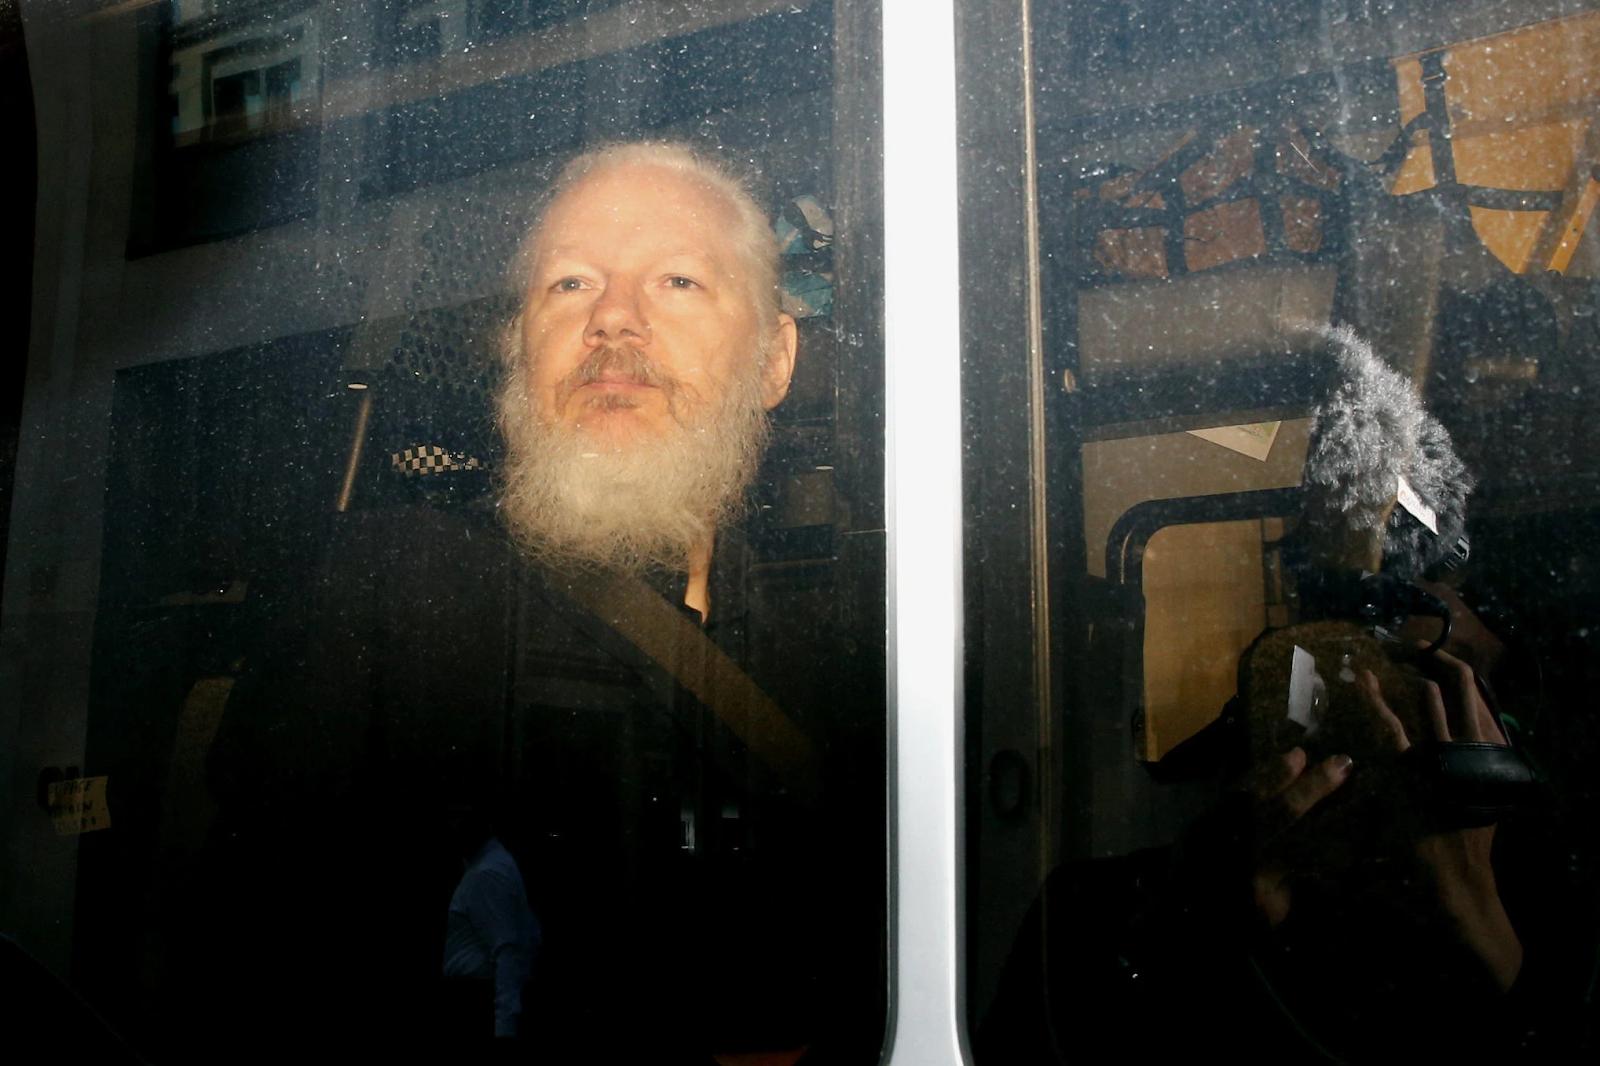 WikiLeaks founder Julian Assange was arrested on Thursday, April 11. Photo: Henry Nicholls/ Reuters